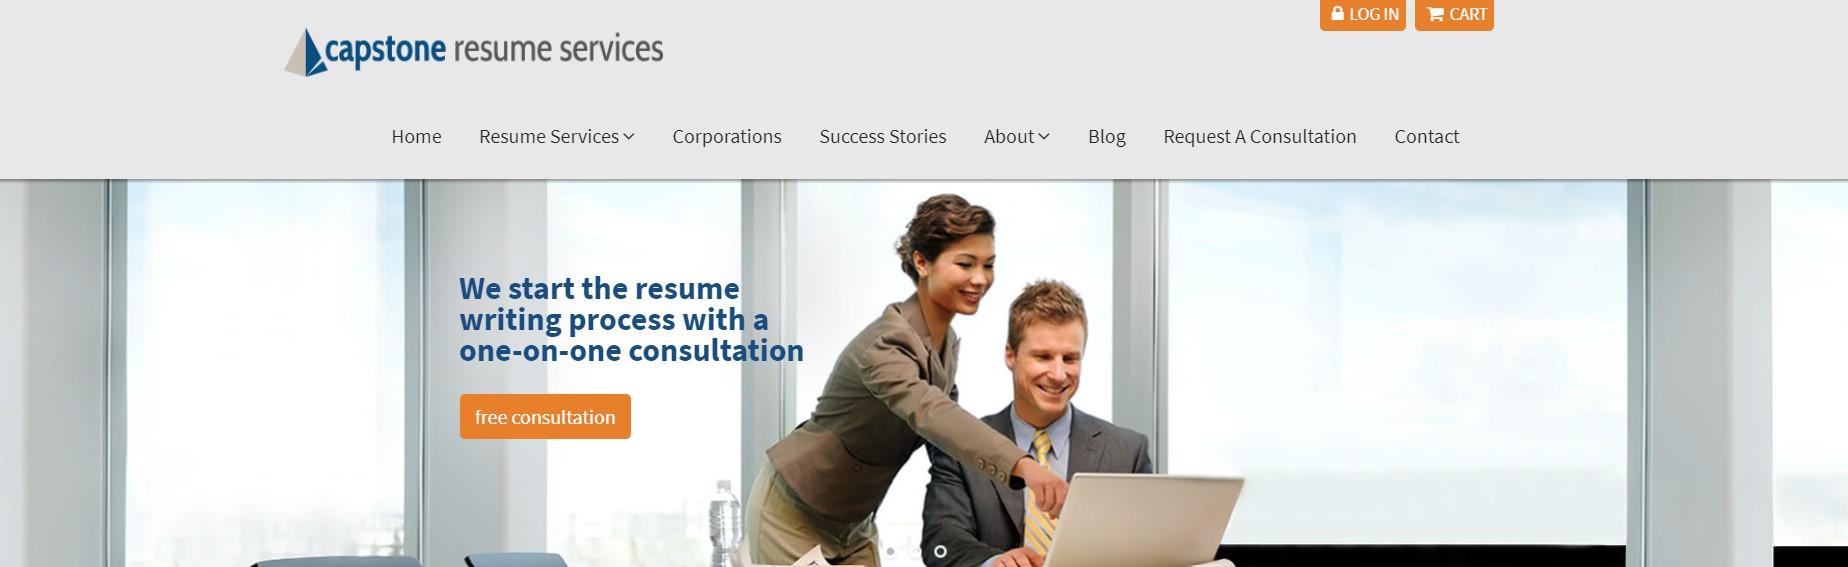 10 Best Resume Writers - screenshot of Capstone Resume Services' homepage